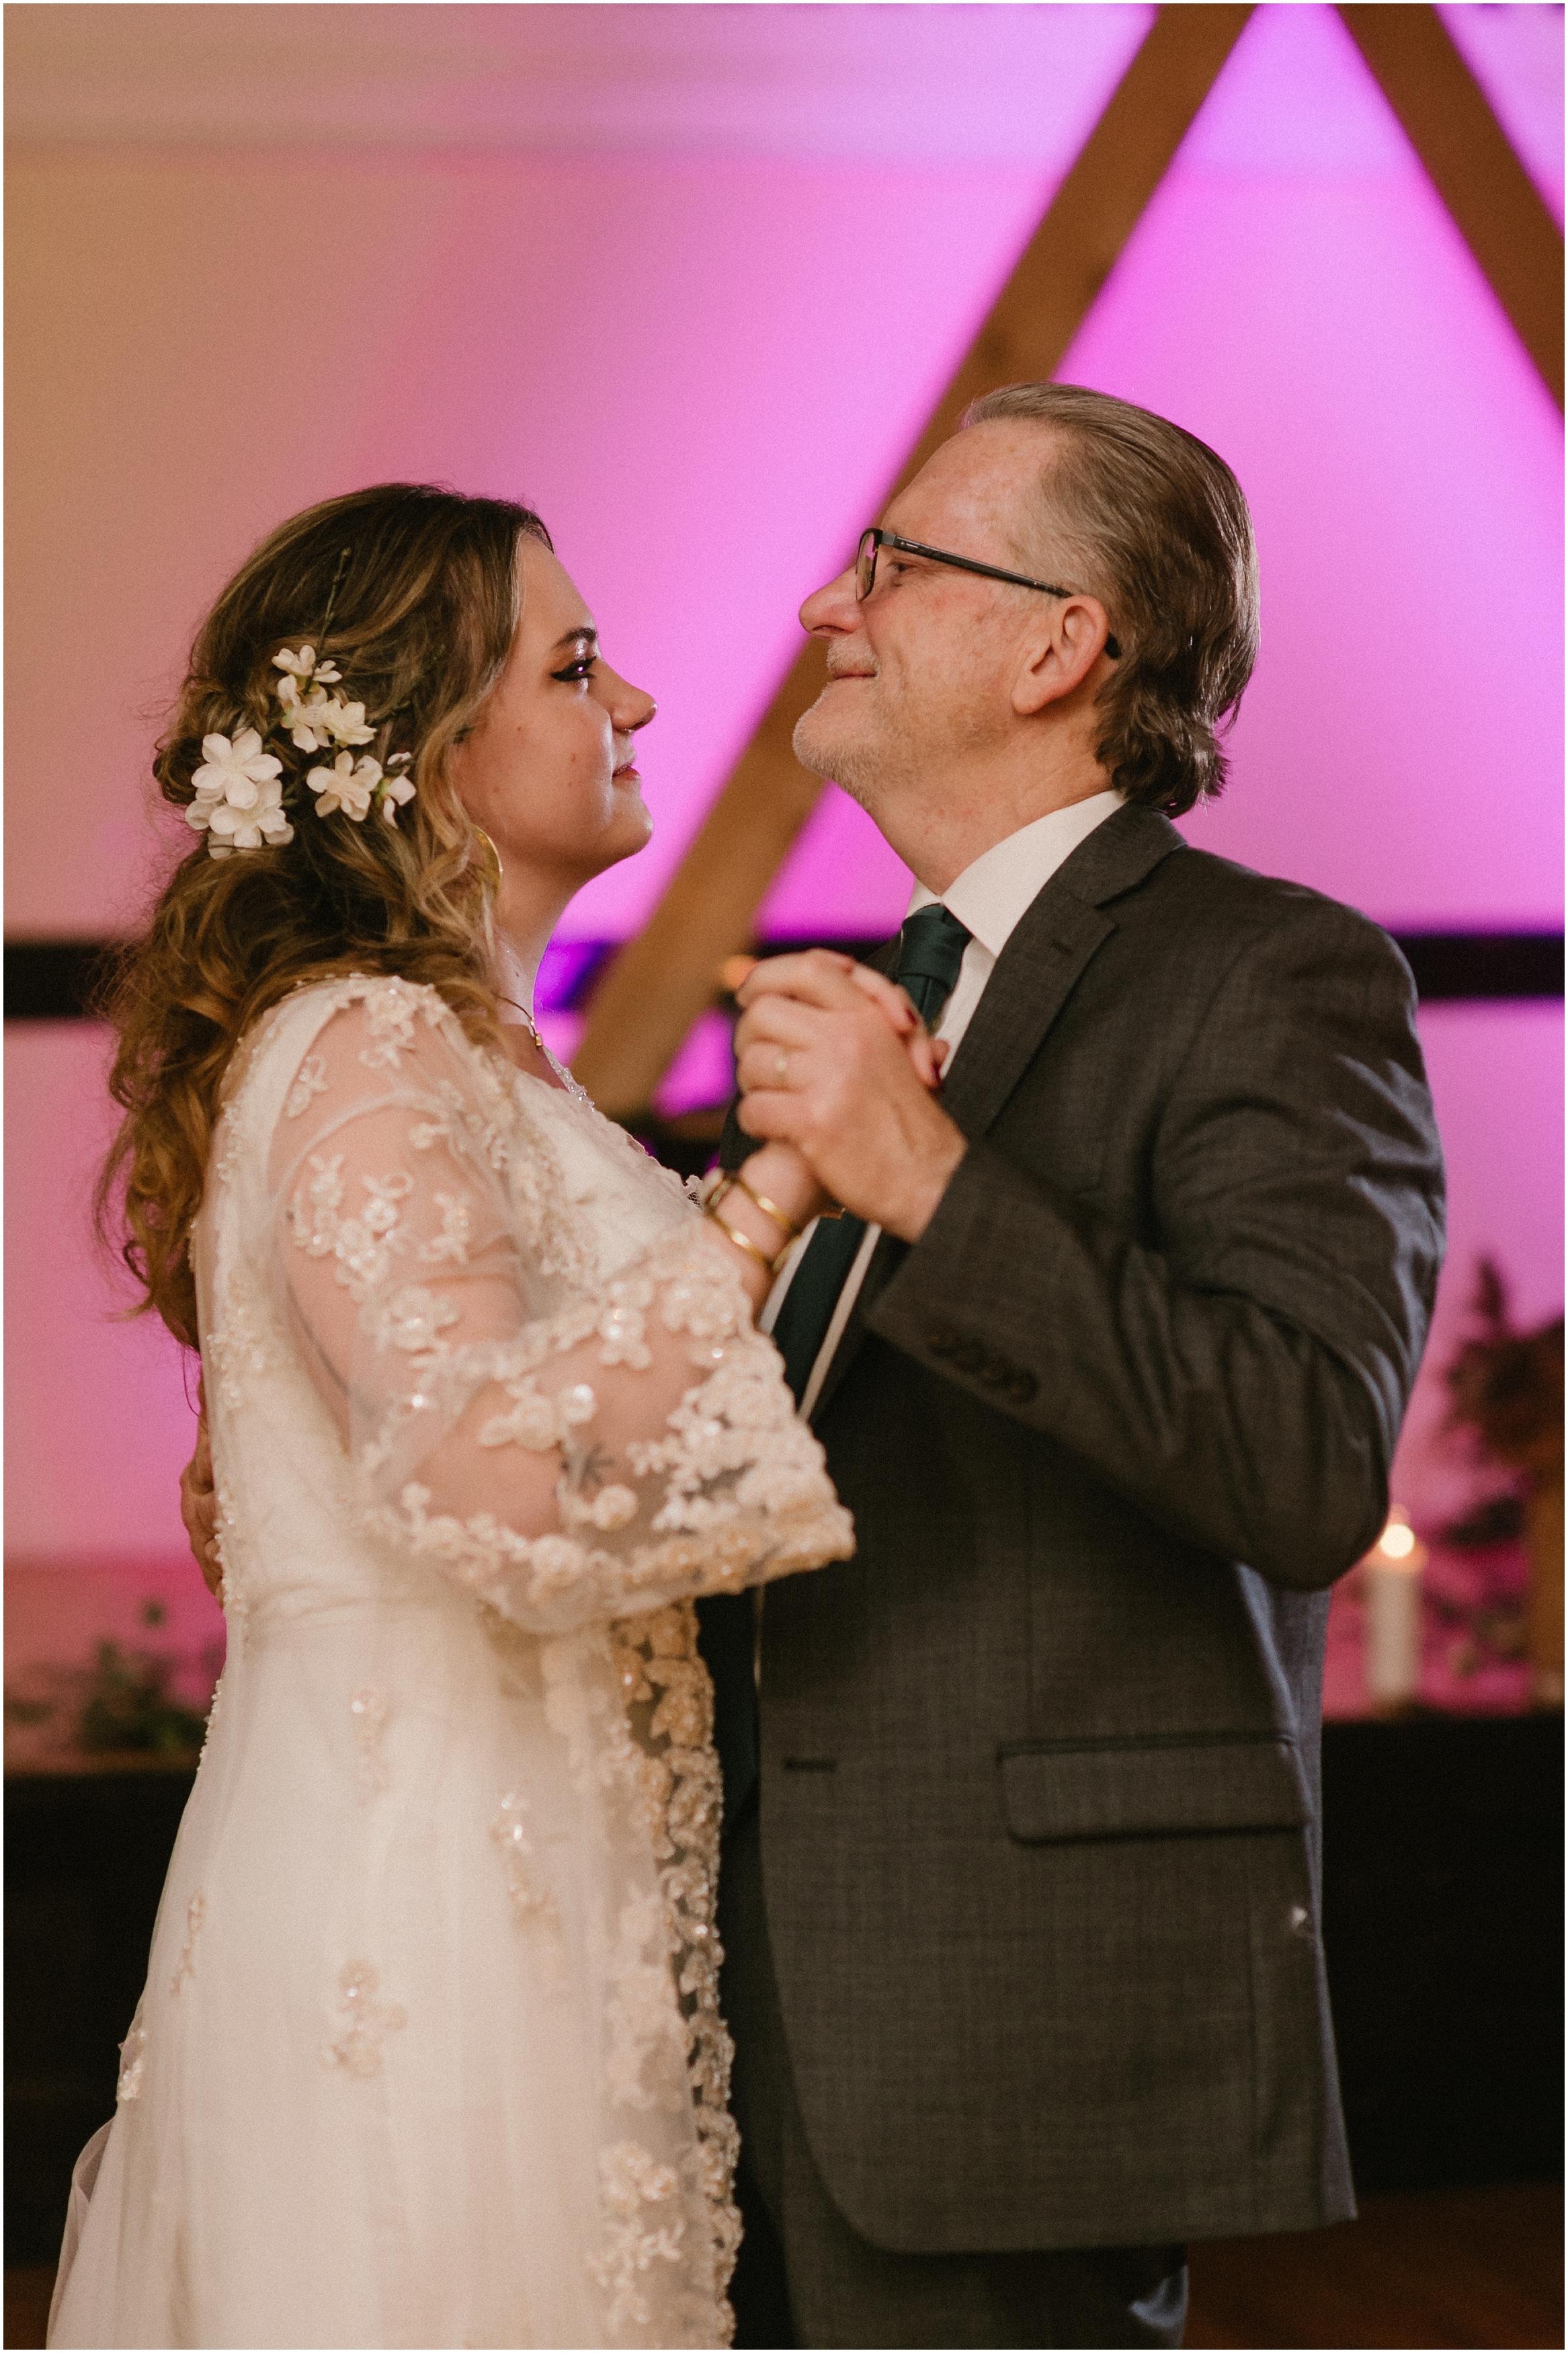 Rebecca_Shehorn_Photography_Indianapolis_Wedding_Photographer_9481.jpg